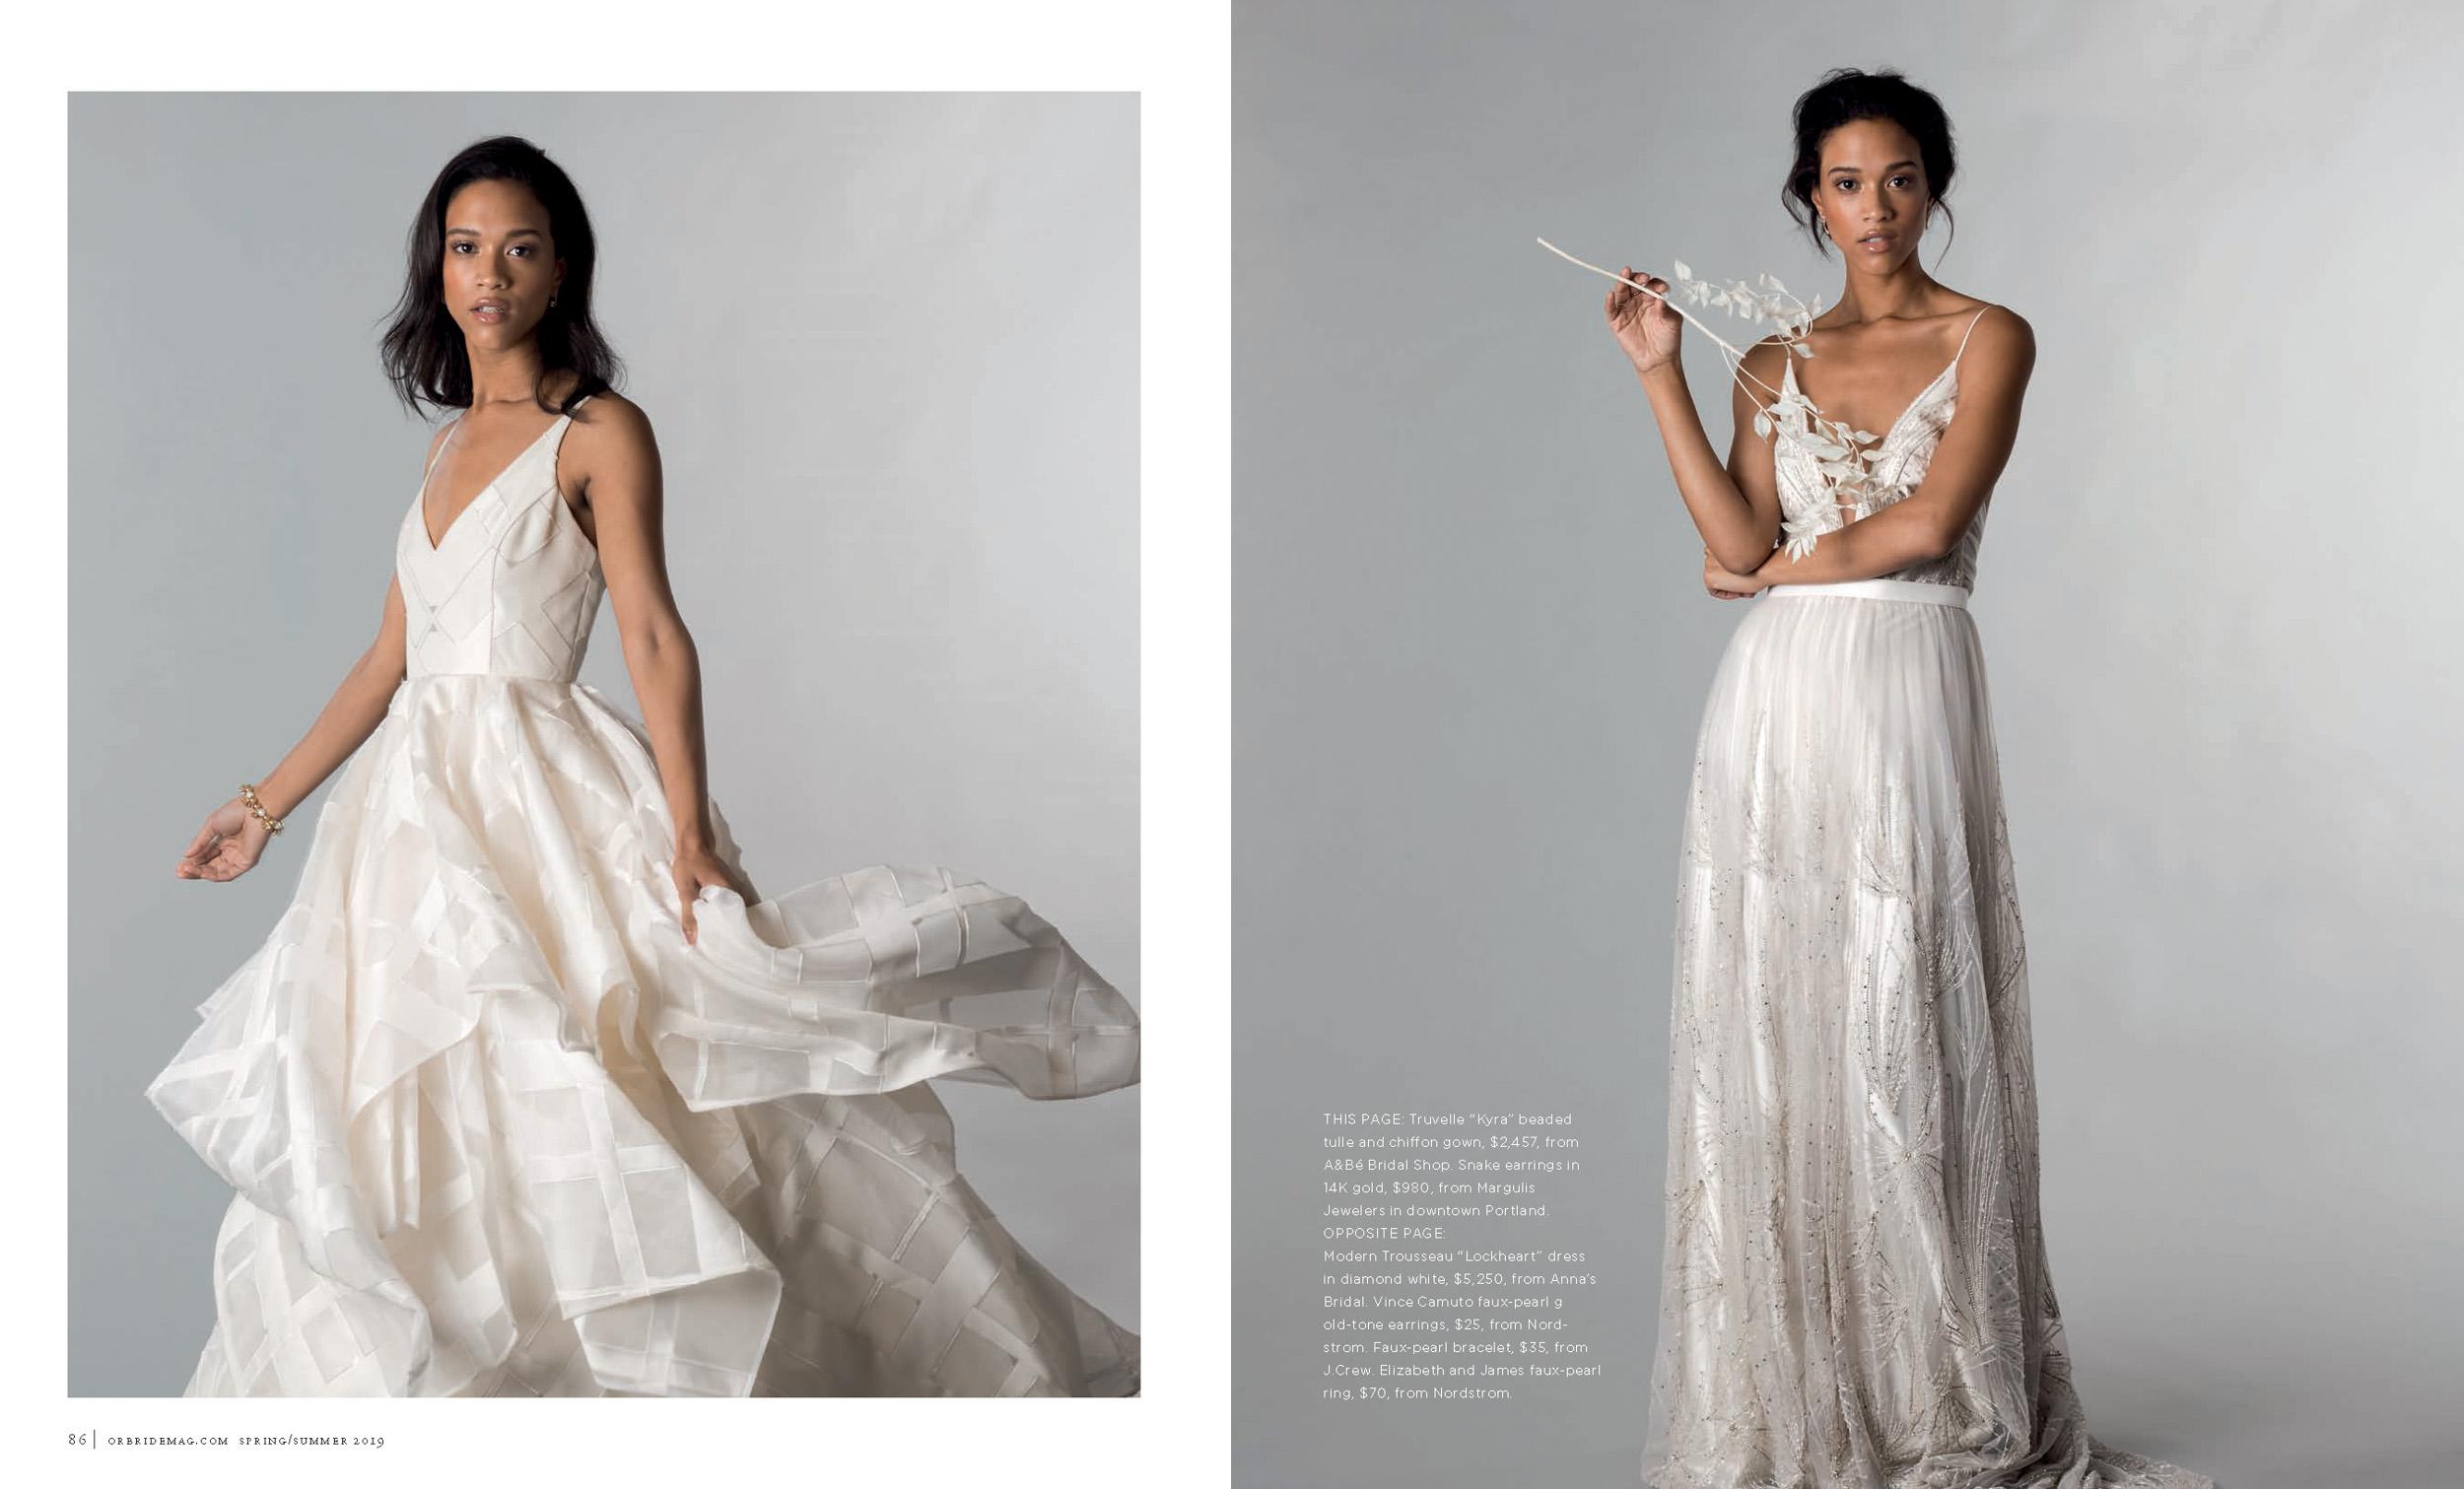 fashion-photography-OBR_SS19_Fashion2A_Page_3.jpg